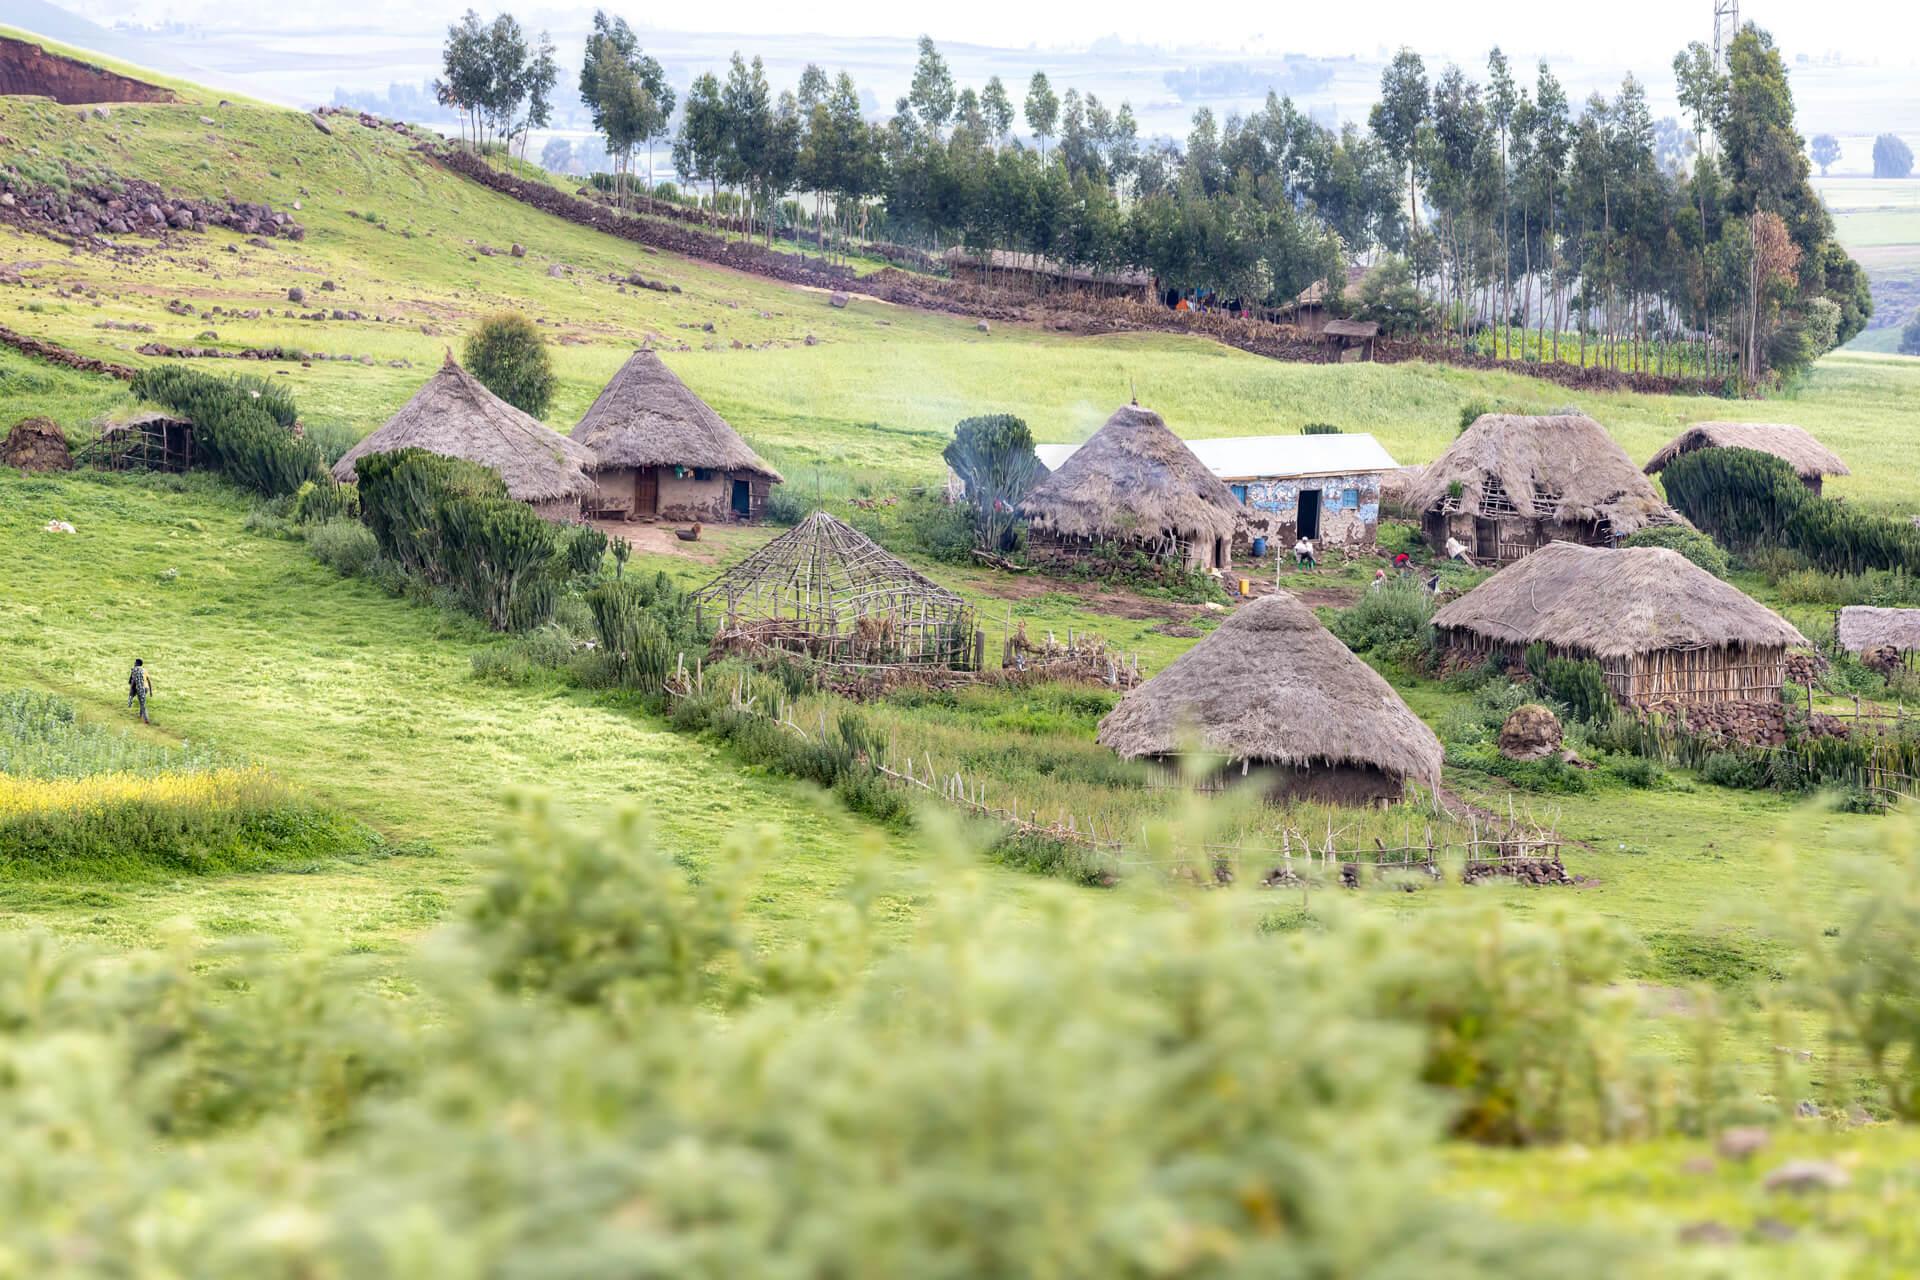 Landscape Ethiopia bale mountains